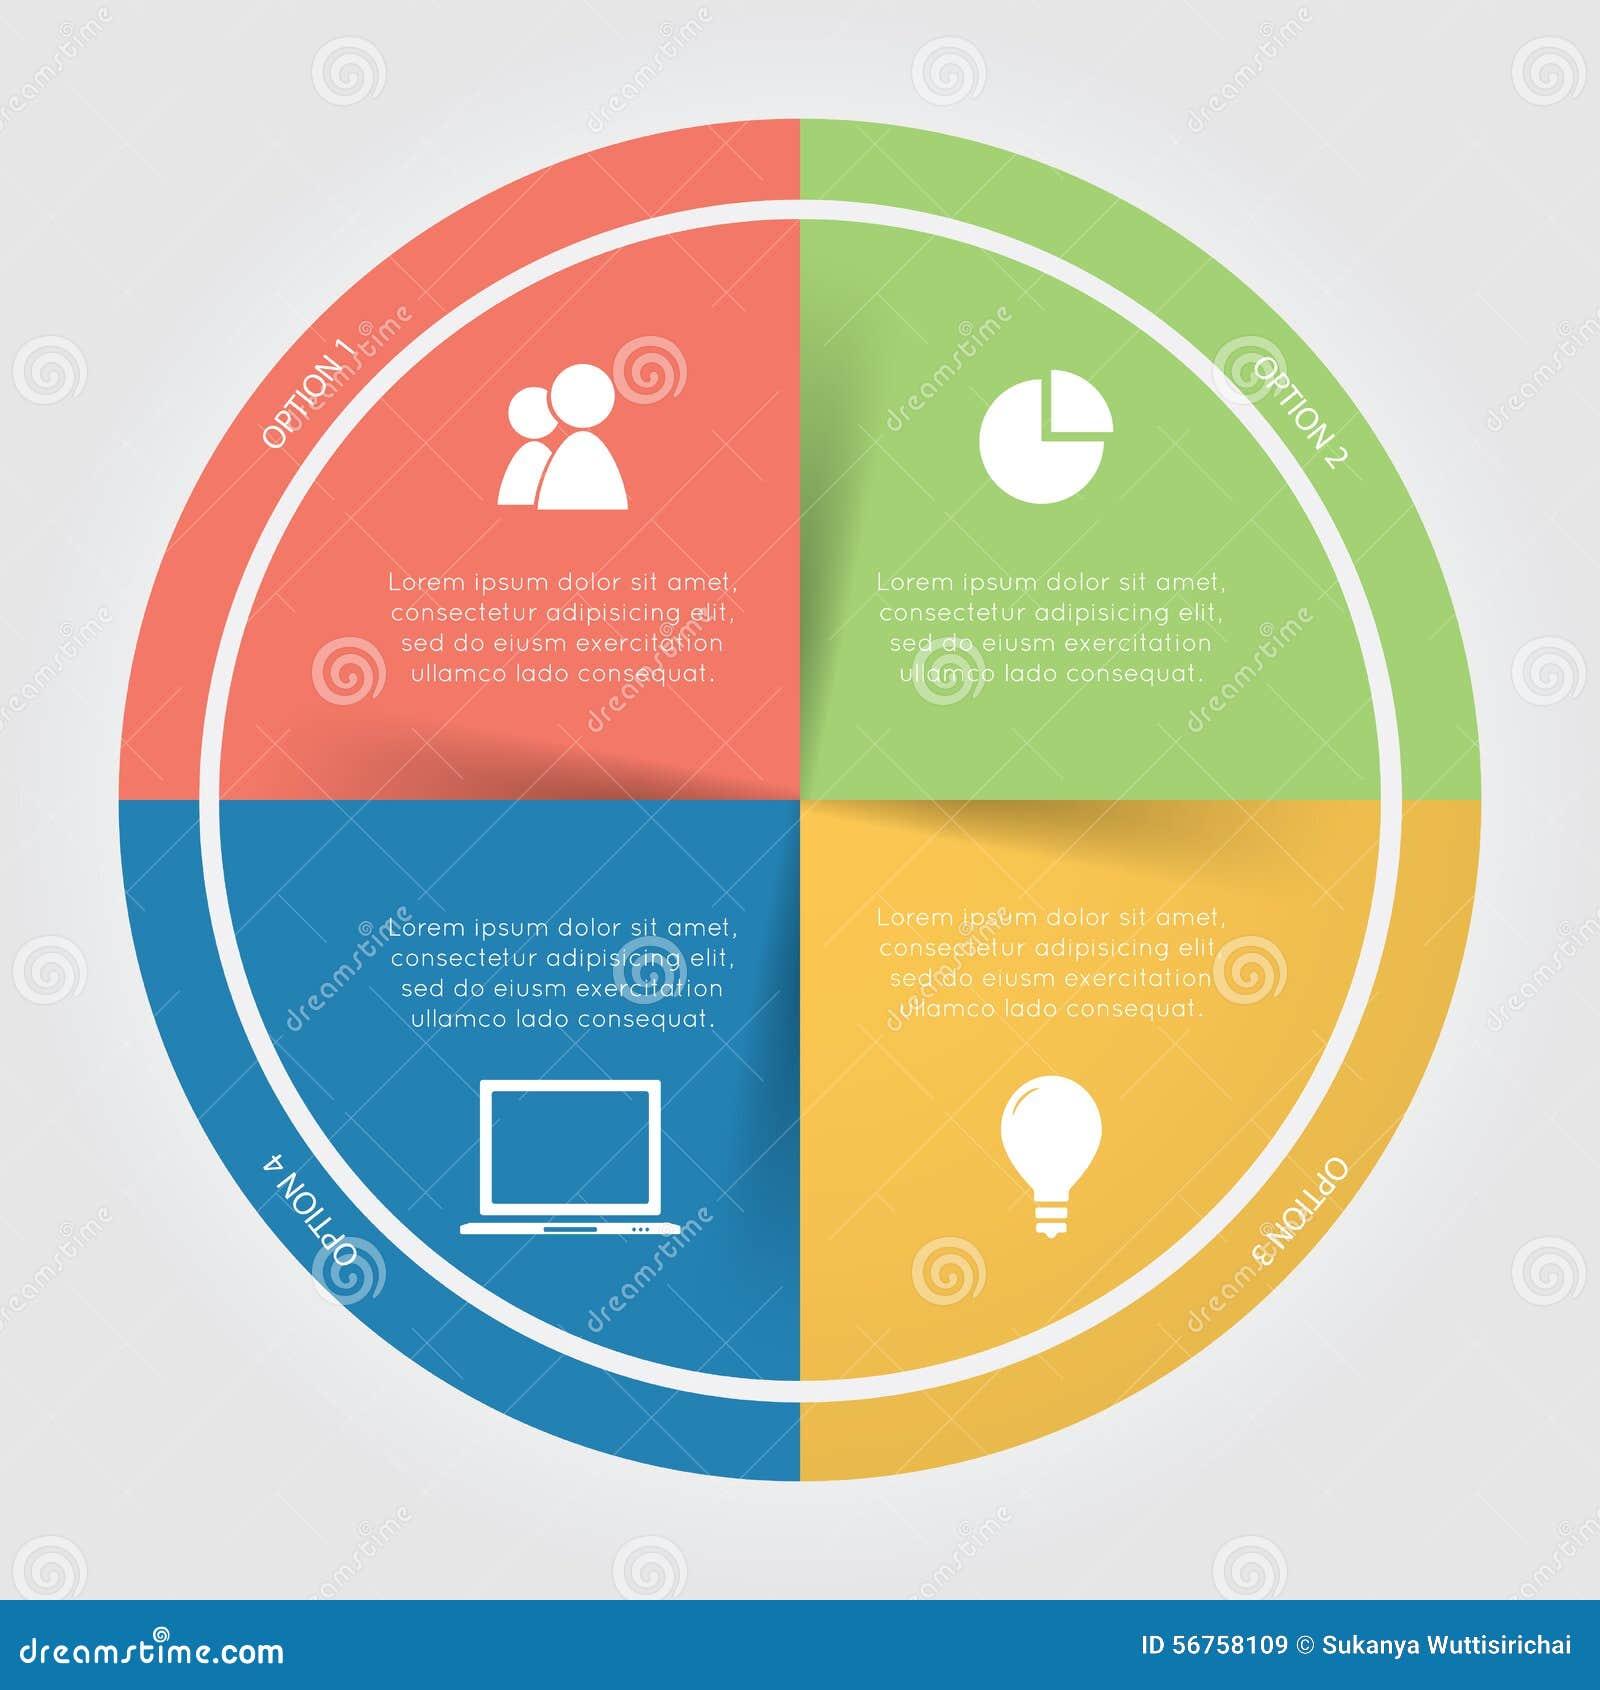 Infographic color circular chart stock image image 56758109 infographic color circular chart nvjuhfo Images